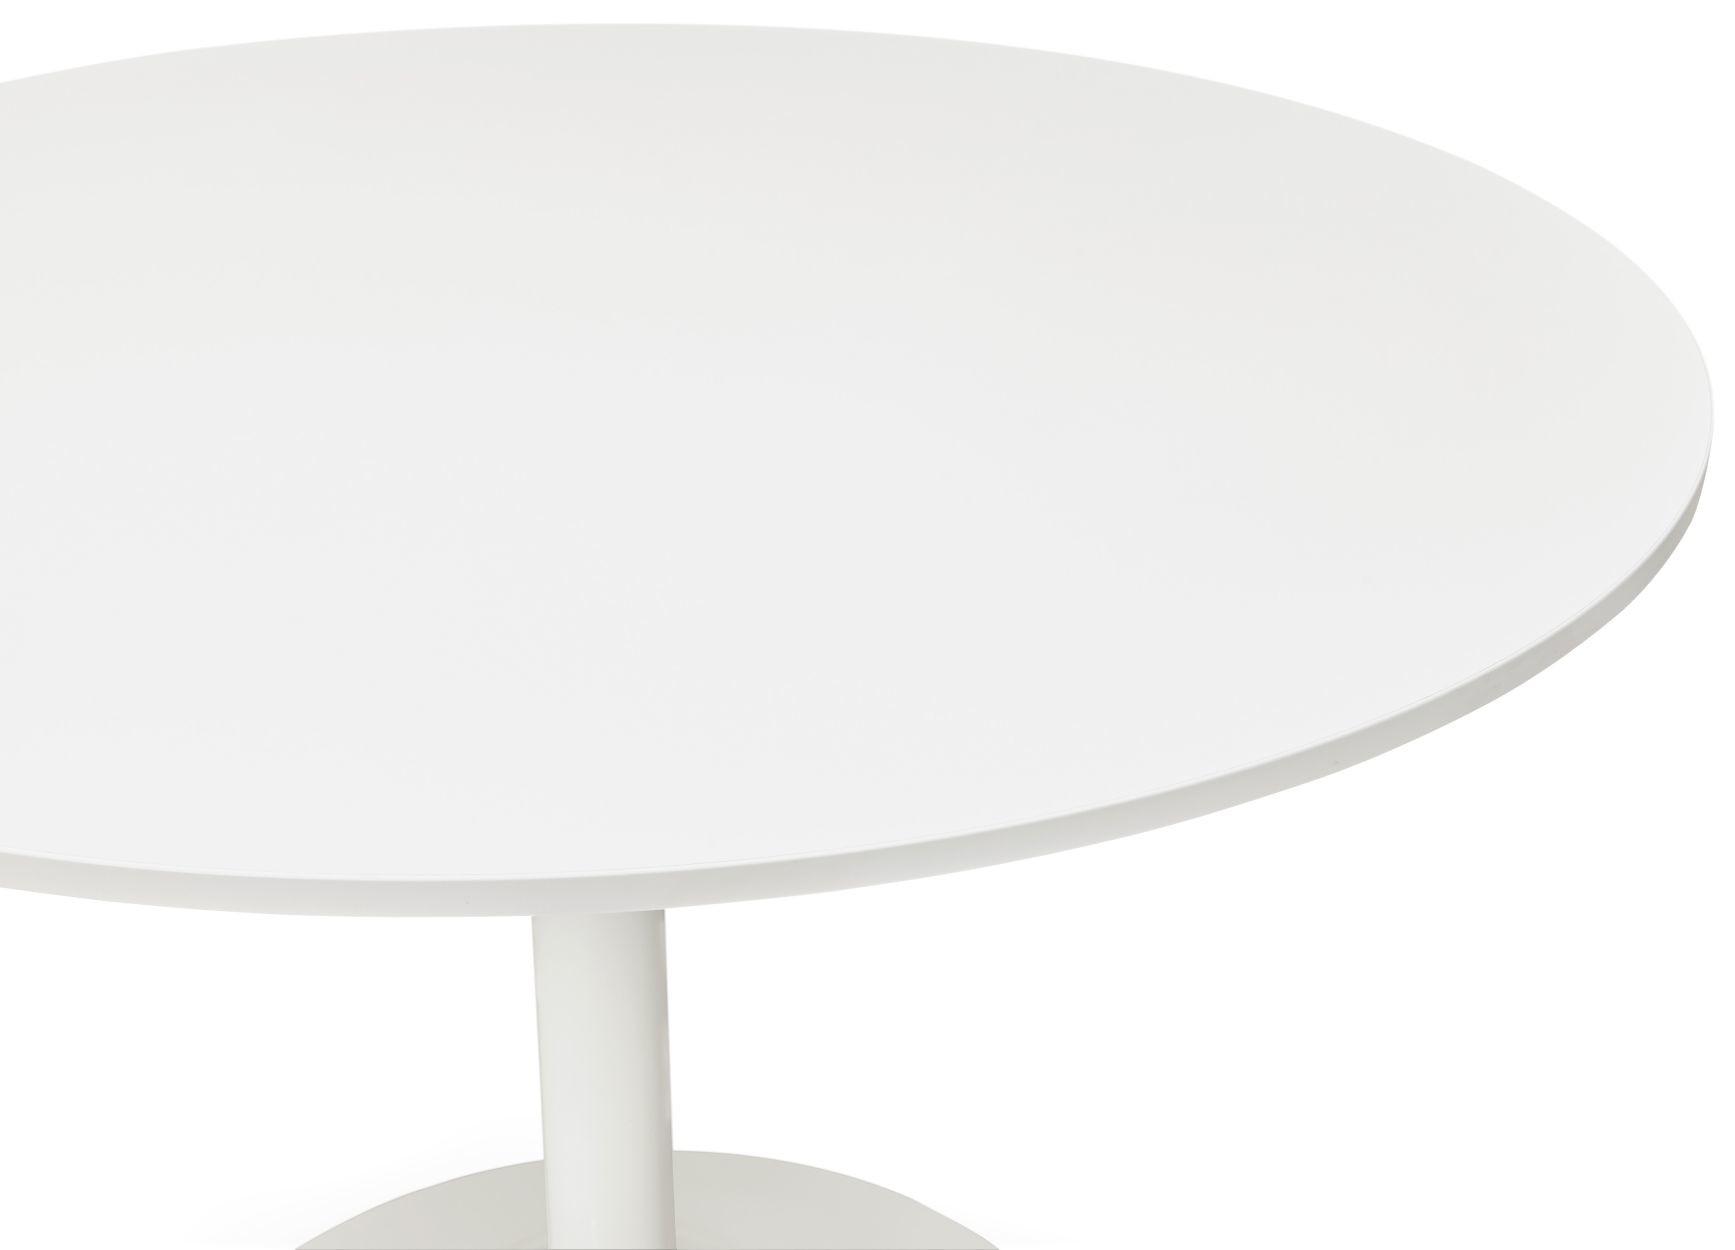 24Designs Ronde Tafel Alonso -Ø120x77 - Wit Tafelblad - Witte Trompetvoet